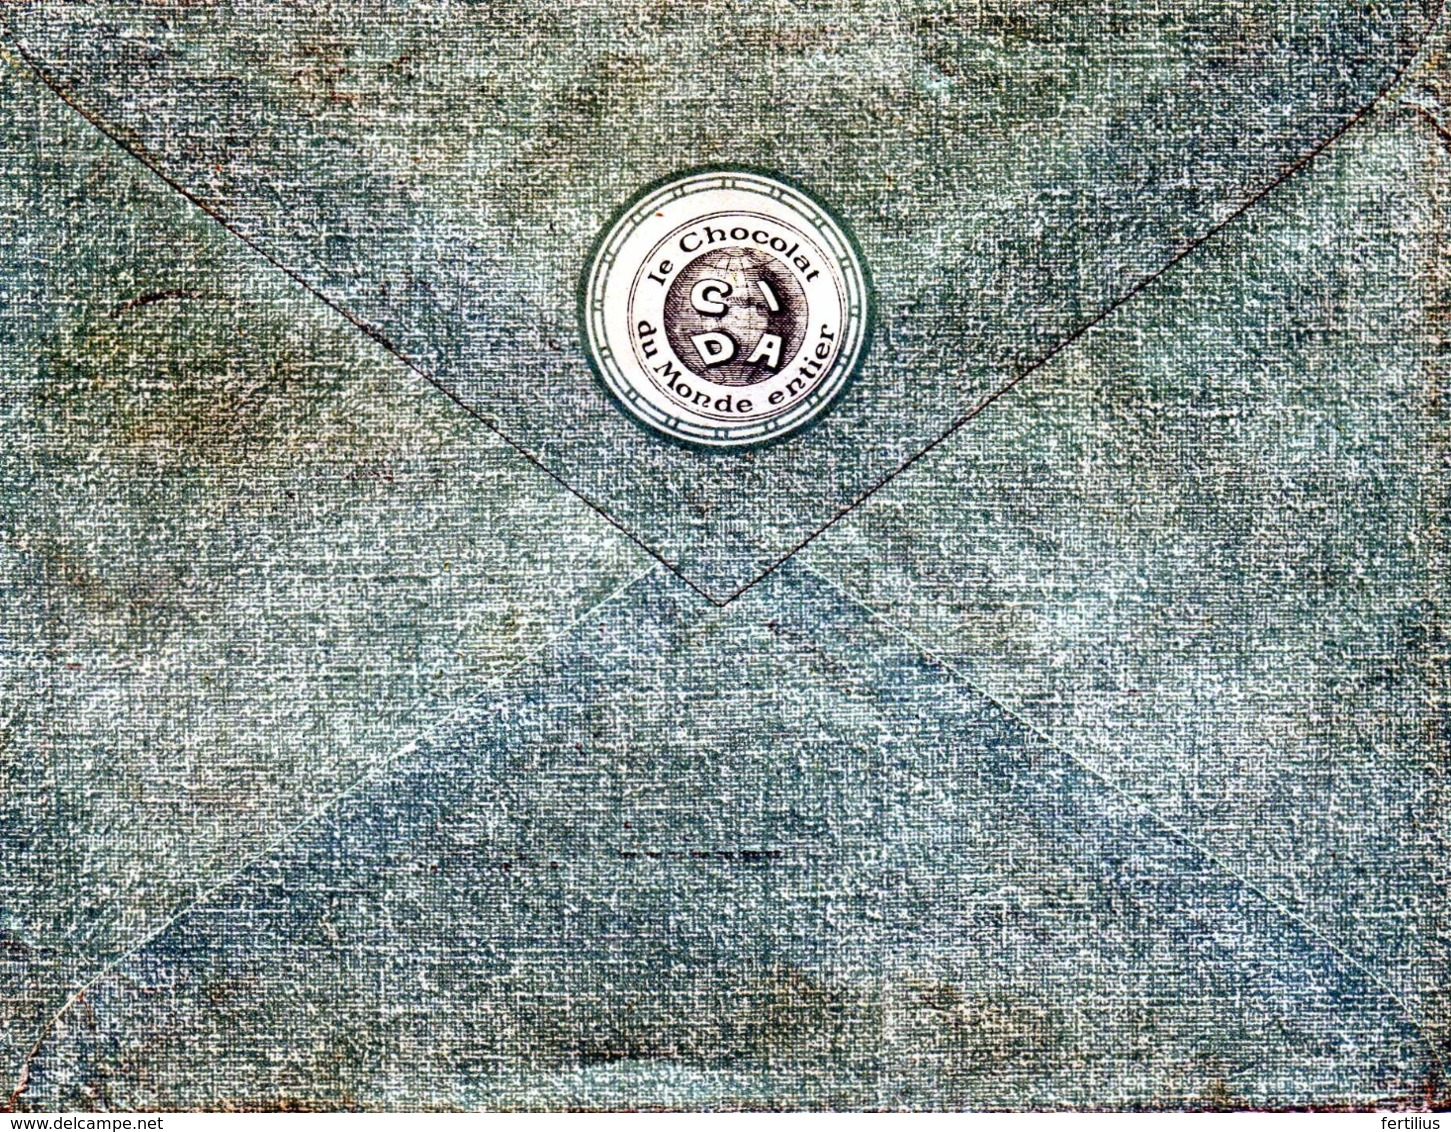 BOIS D'HAINE, Chocolaterie Cida / LSC De 1929 > Armée Du Rhin à Trêves TB - Postmark Collection